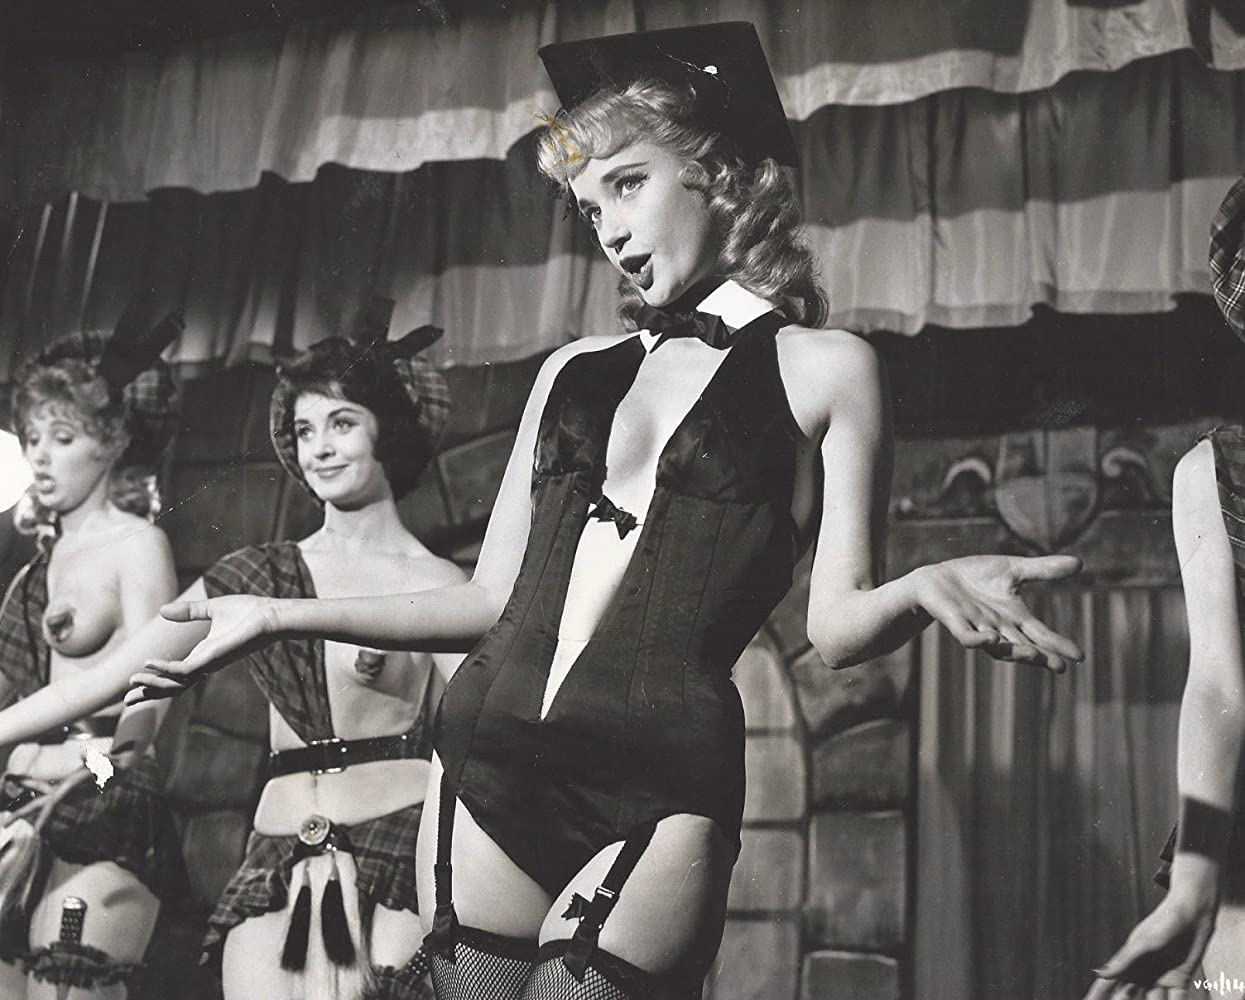 Lisa Davis (actress),Anna Christine Speckhart USA Porno fotos Judy Lynne,Gladys Reyes (b. 1978)